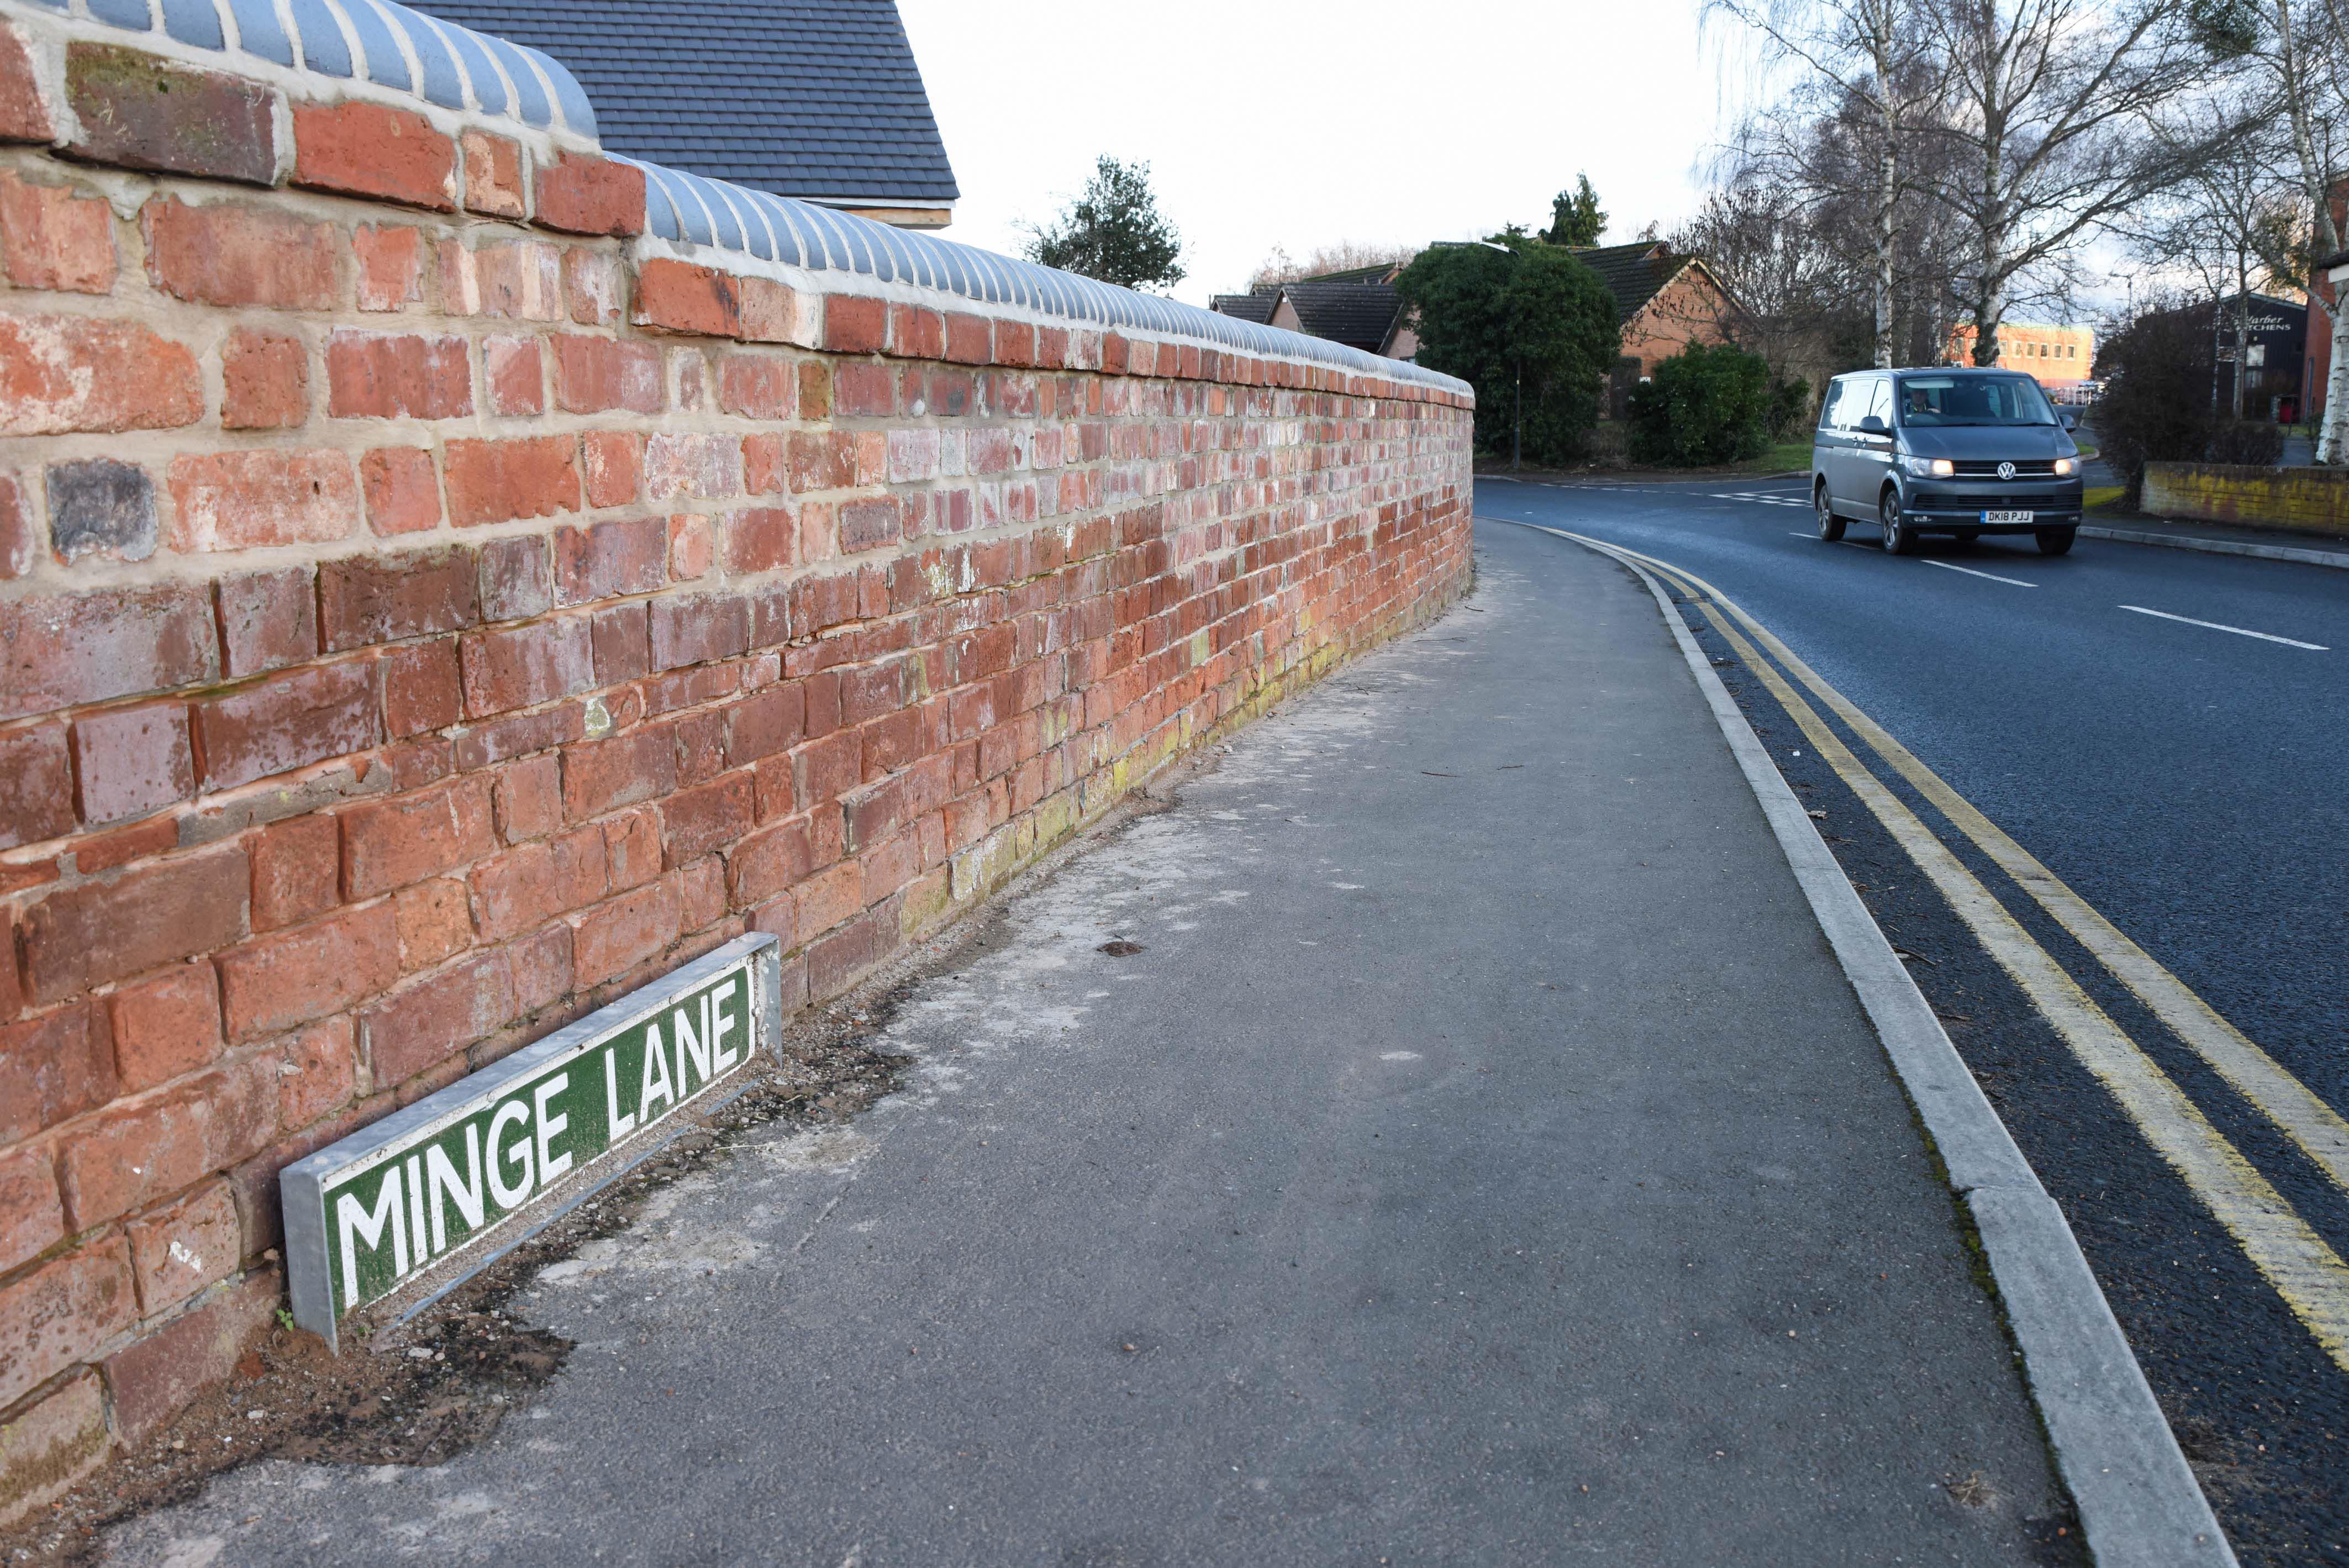 Minge Lane in Upton-upon-Severn. Credit: Caters